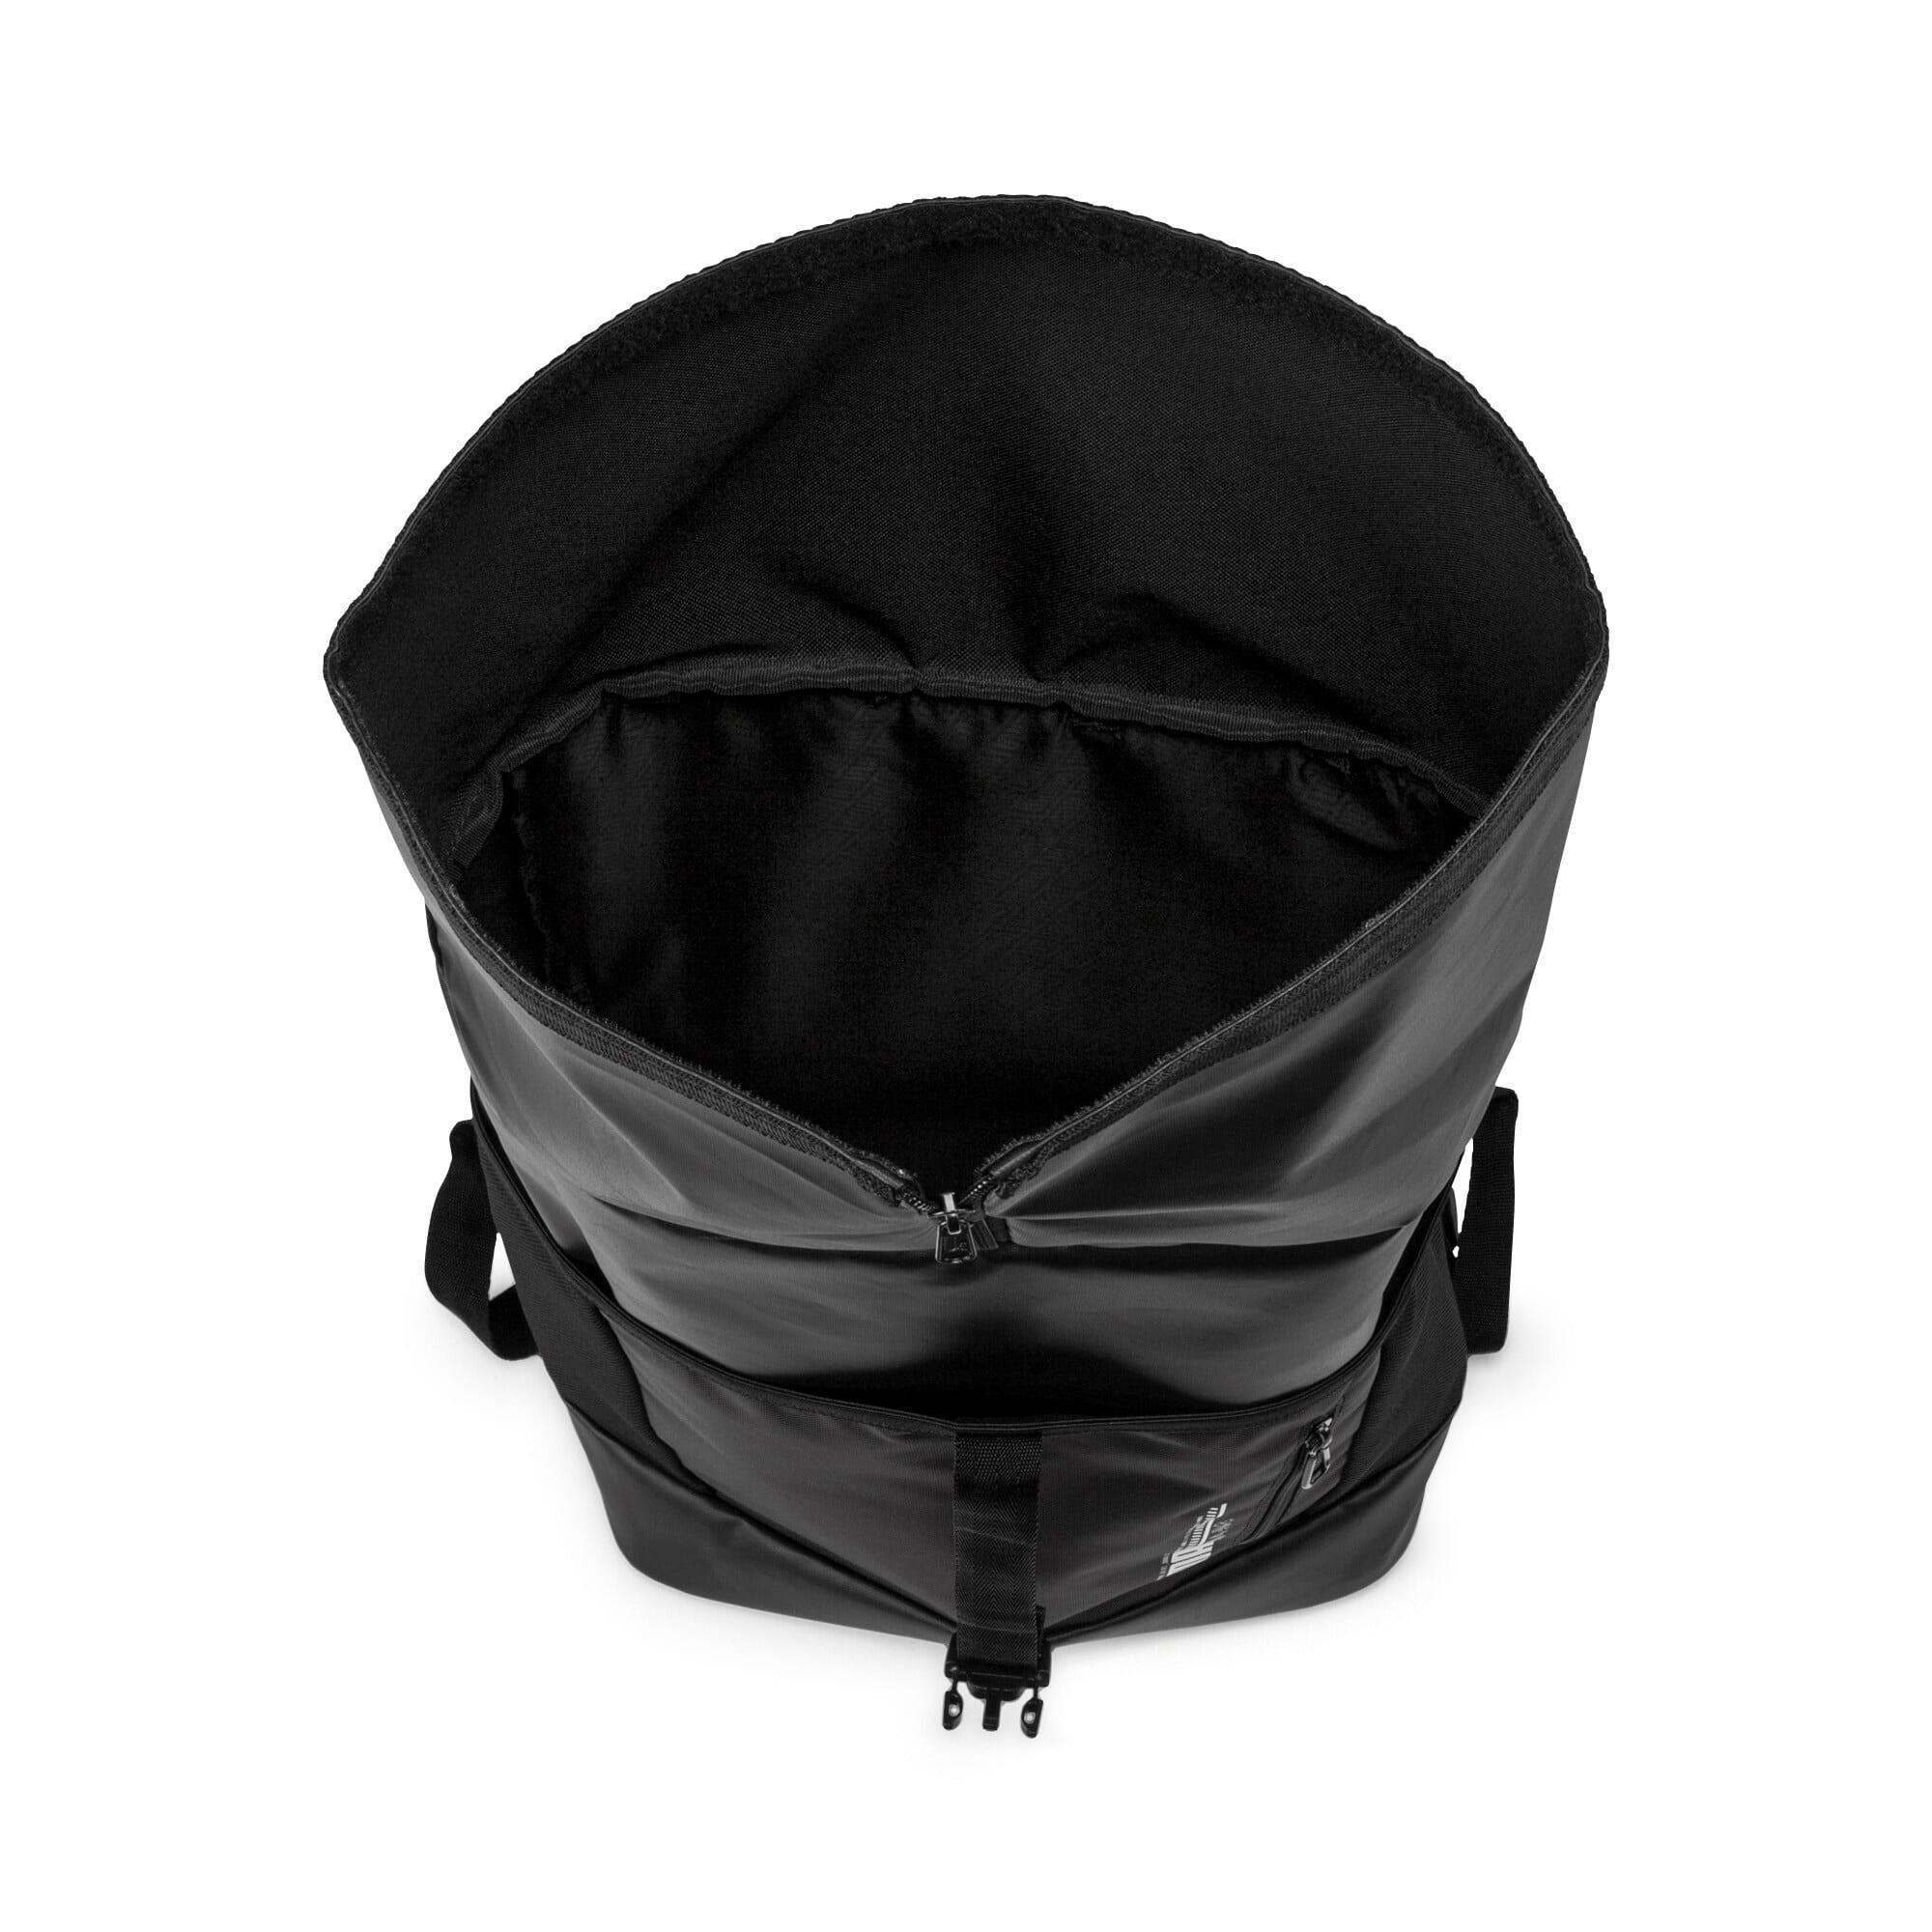 Thumbnail 4 of Energy Rolltop Backpack, Puma Black, medium-IND